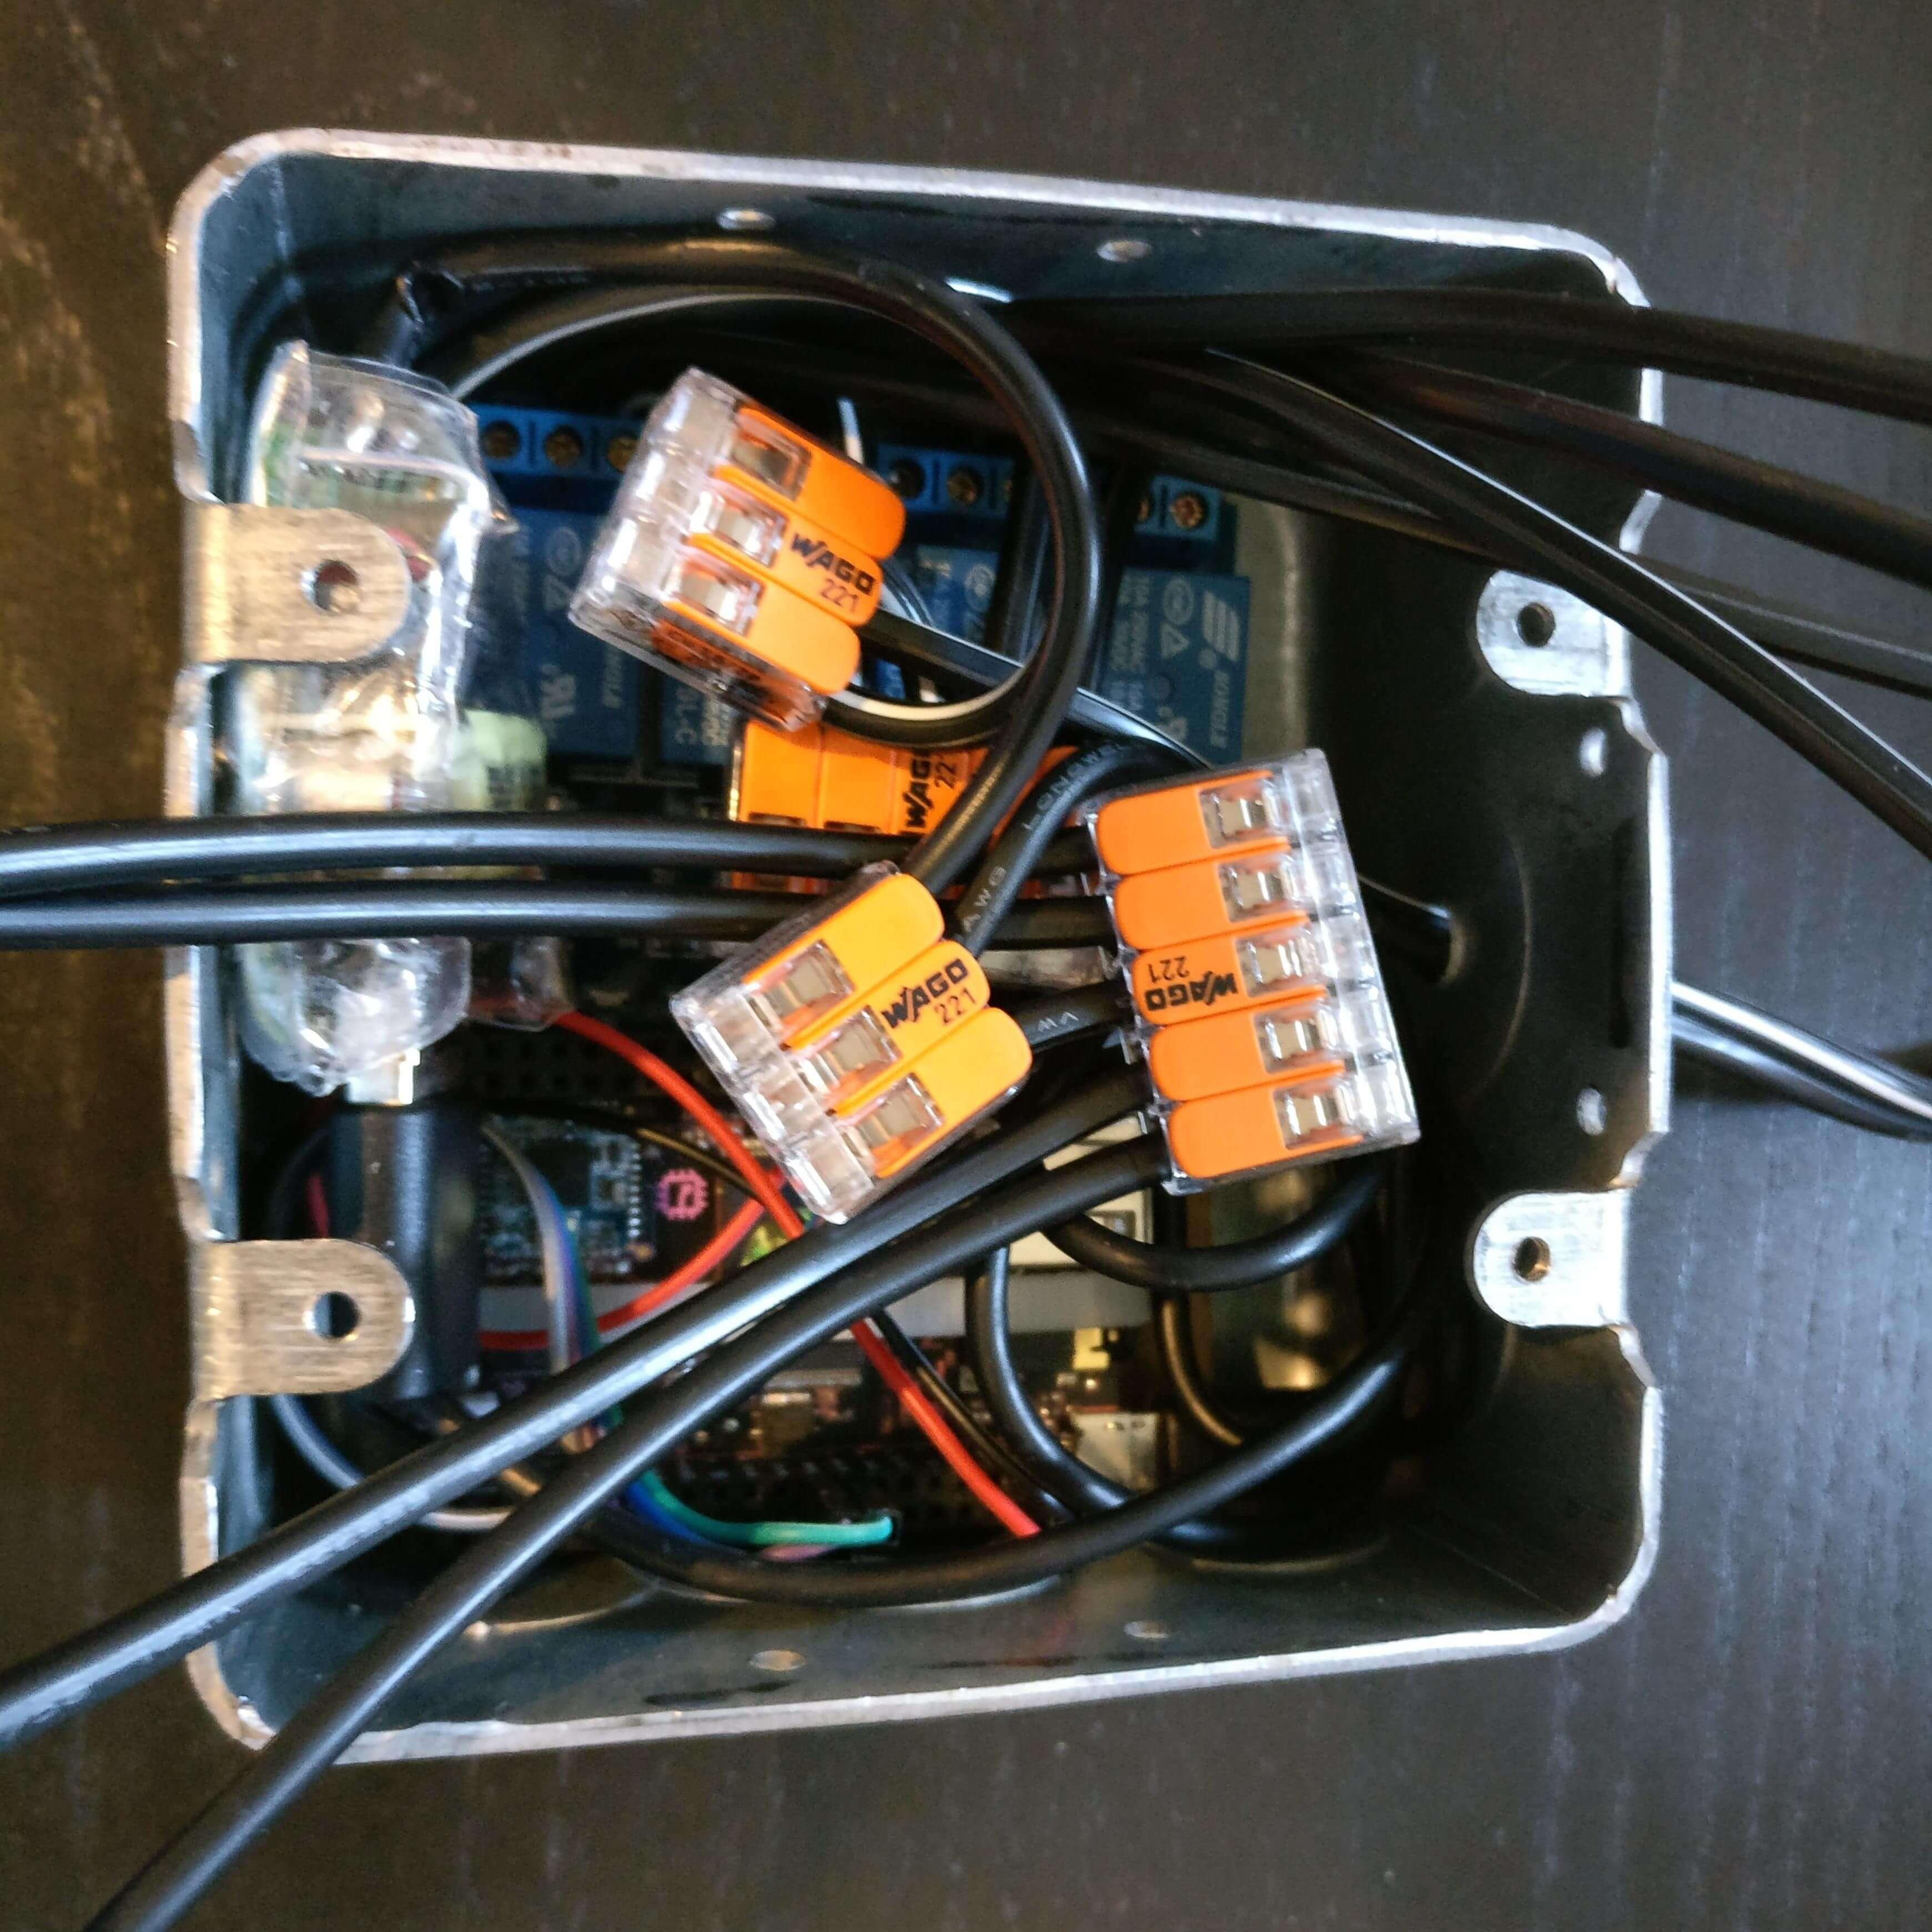 src/img/showcase/powerbox-in-box.jpg